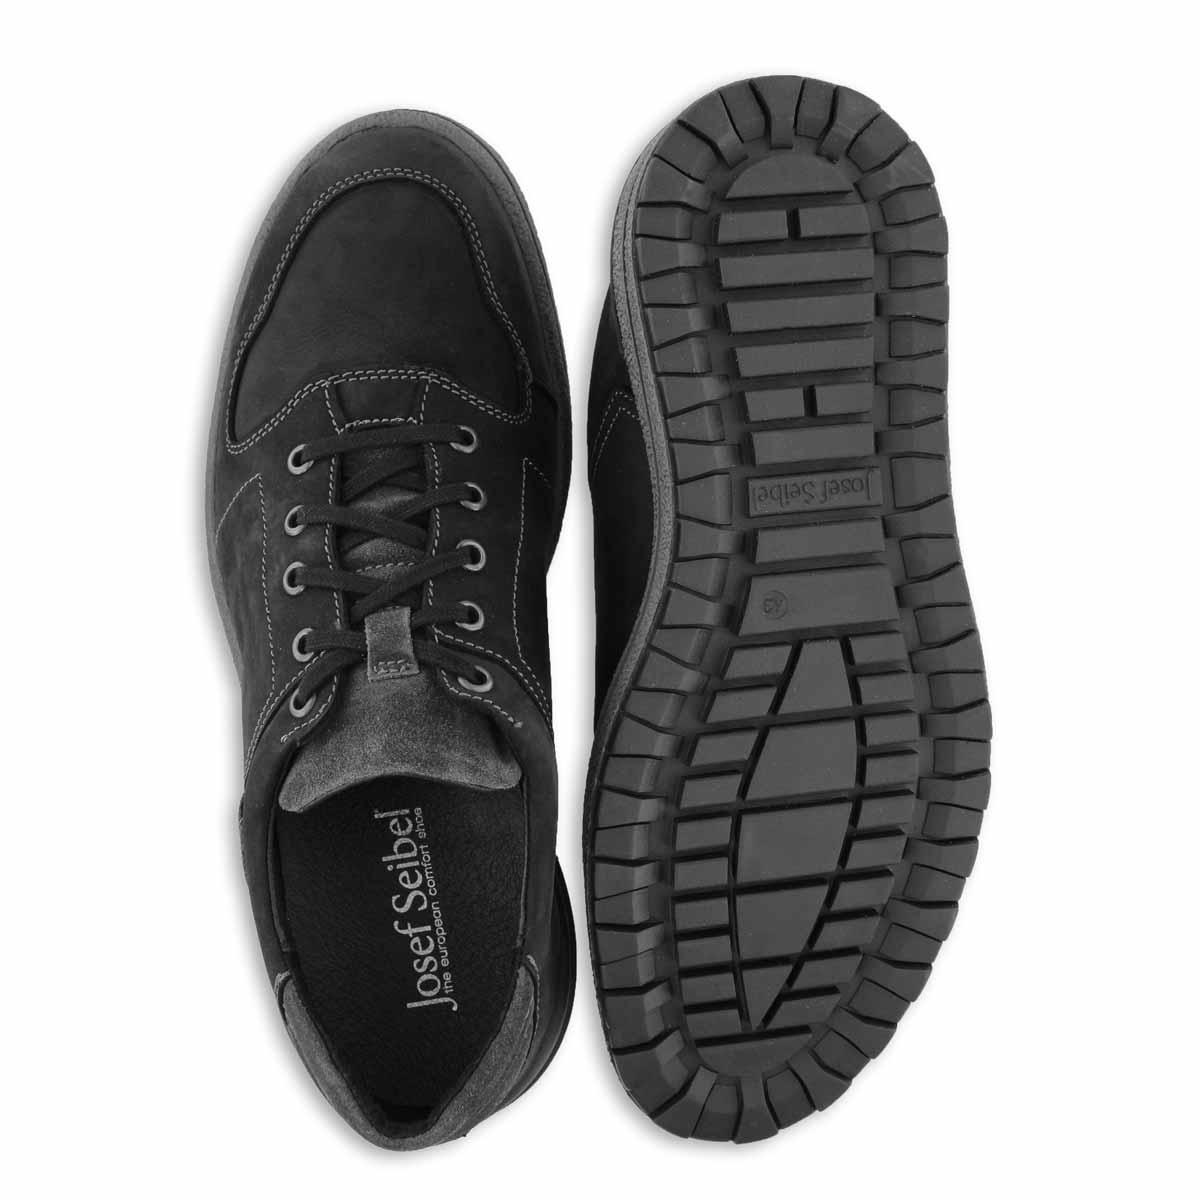 Men's EMIL 17 schwarz lace up sneakers